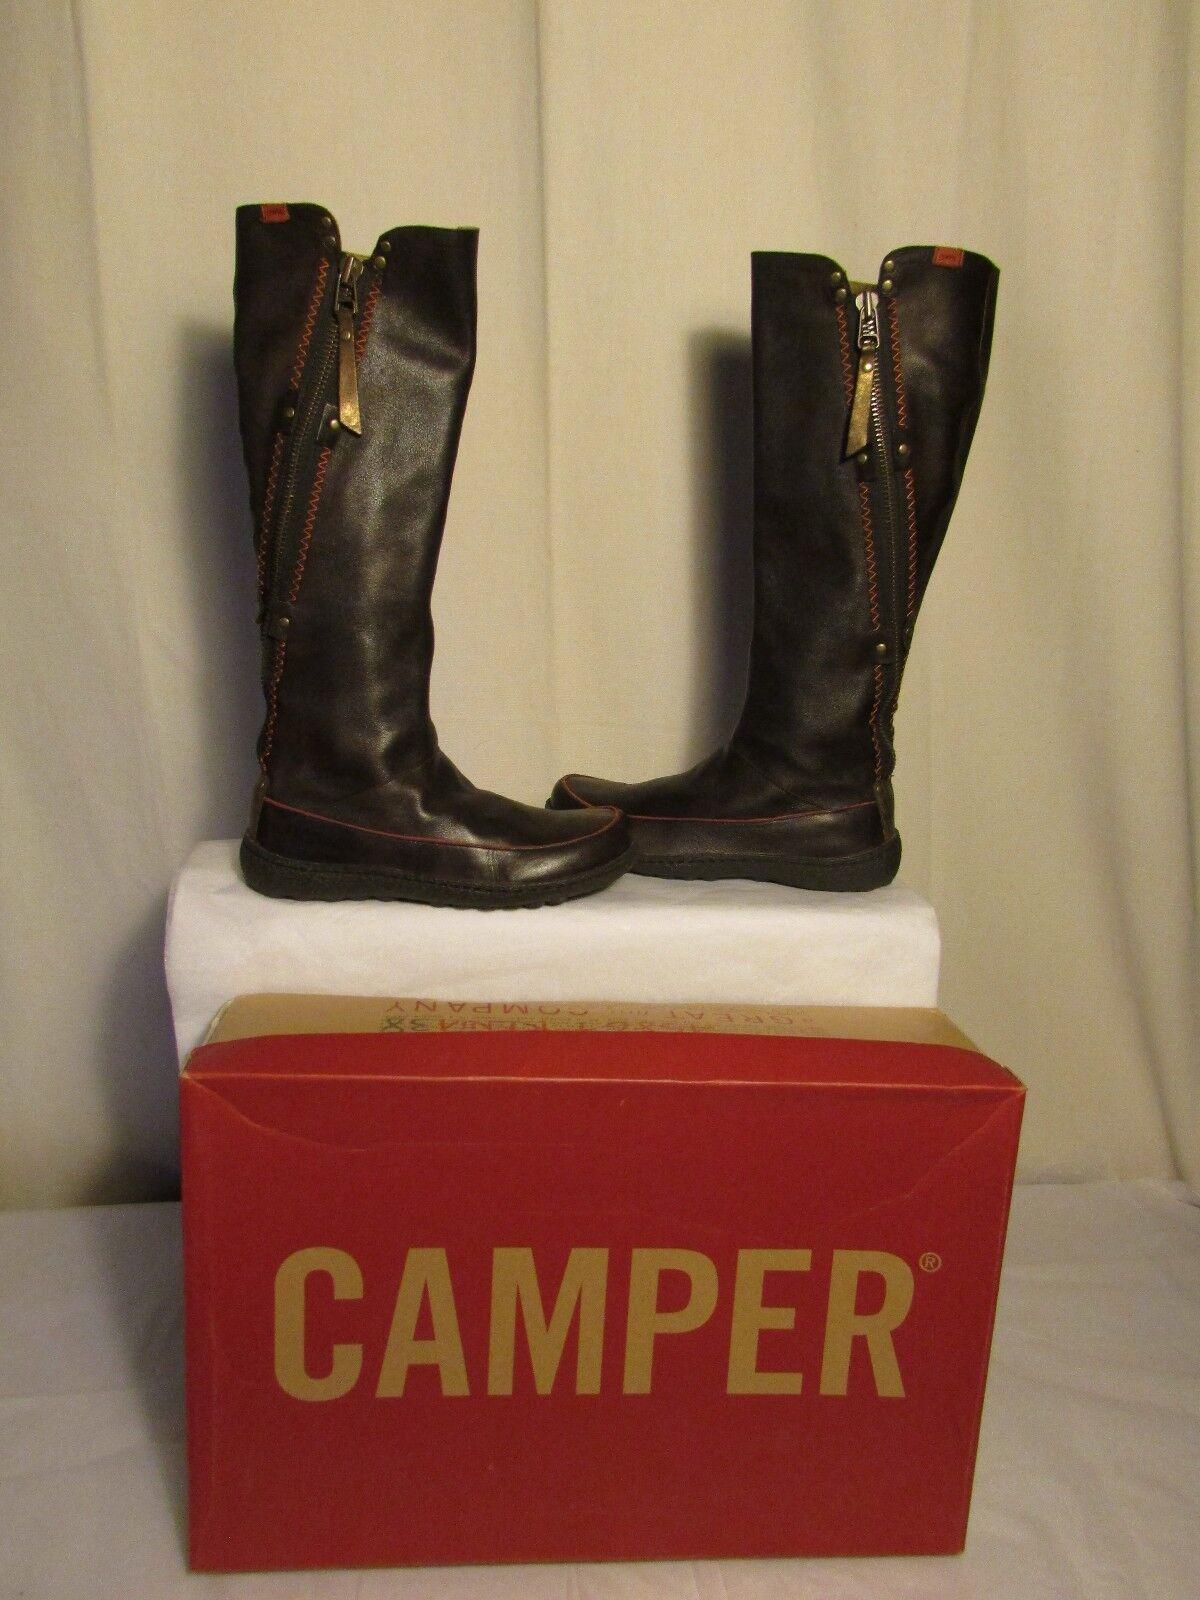 stiefel camper camper camper leder braun 38 b69537